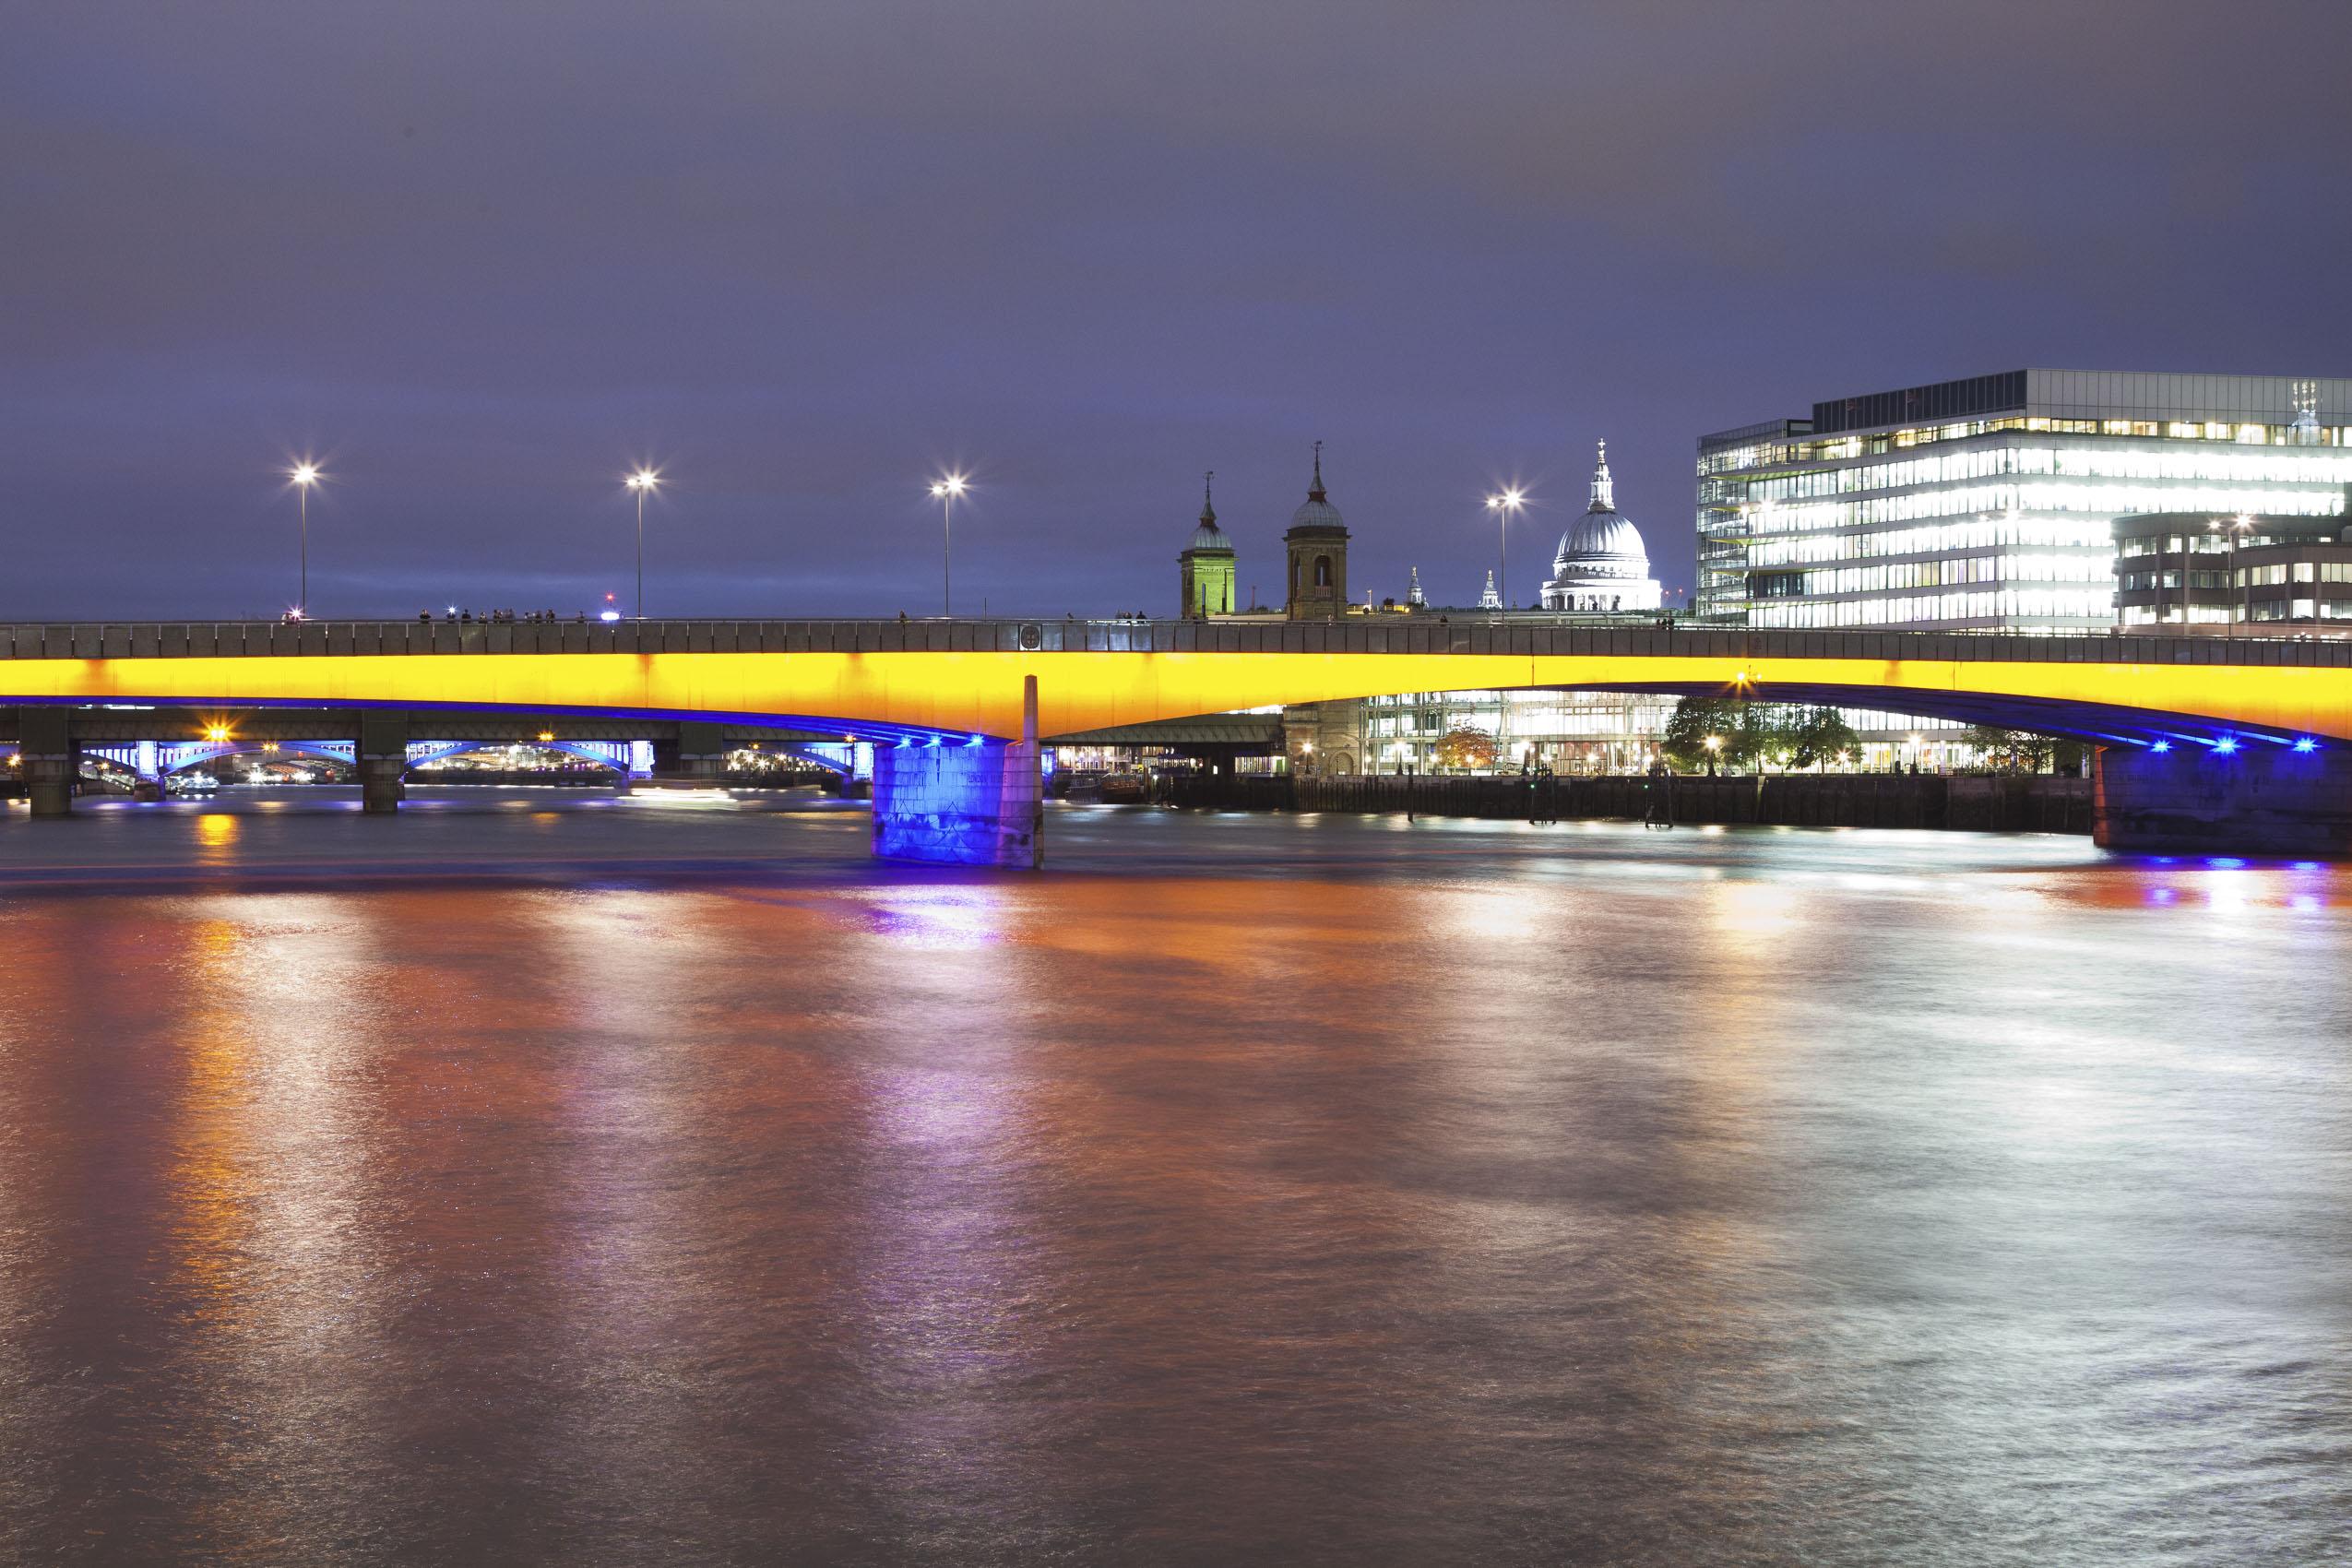 london_london_bridge_thames_night.jpg